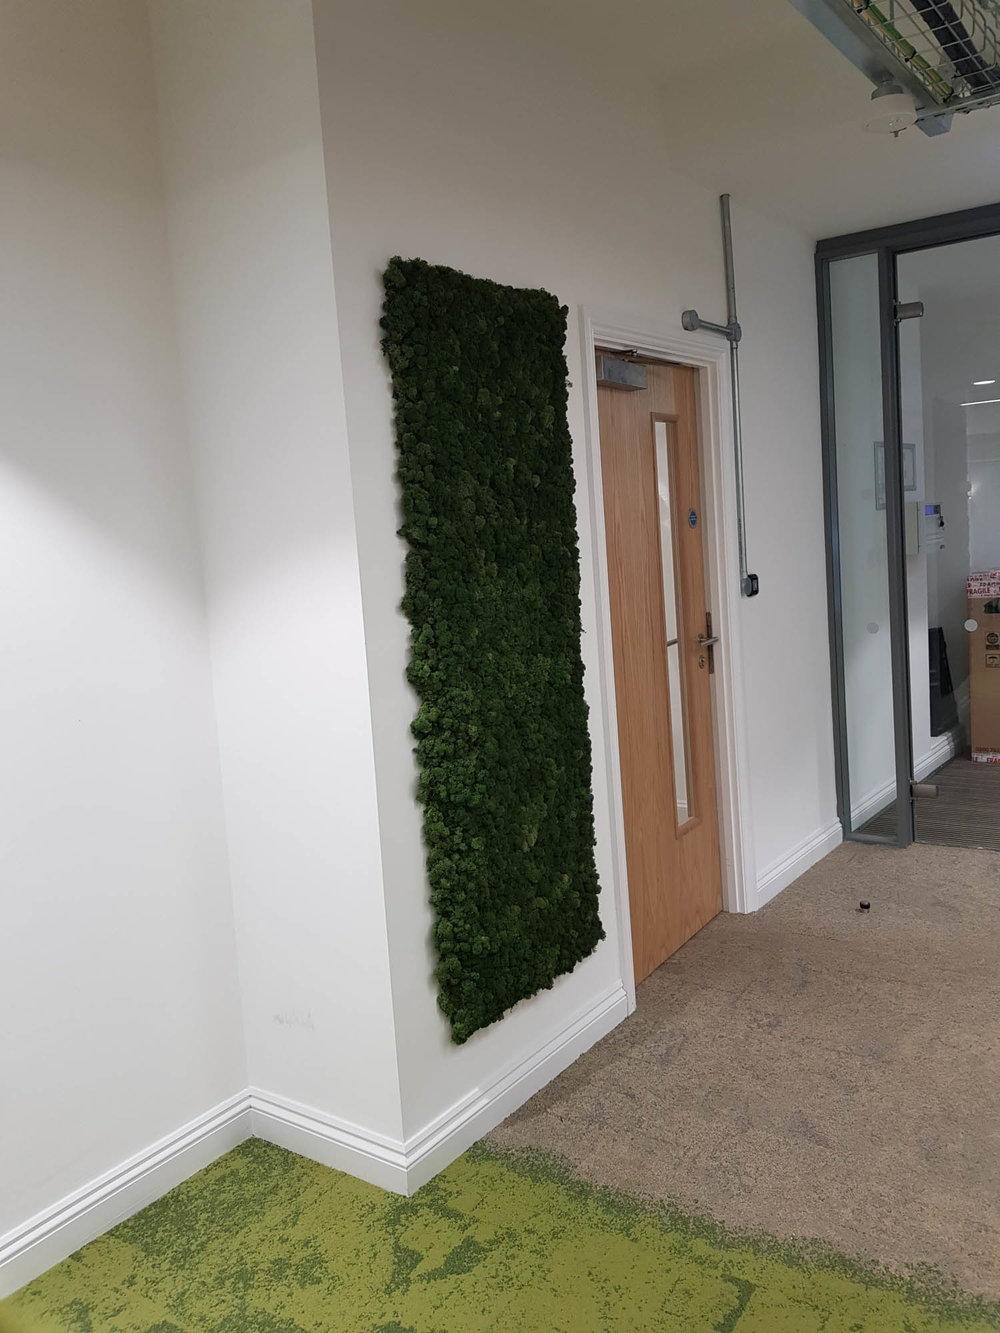 cookpad-interior-plants-mosswalls-branded-planters-plantcare-bristol-image-2